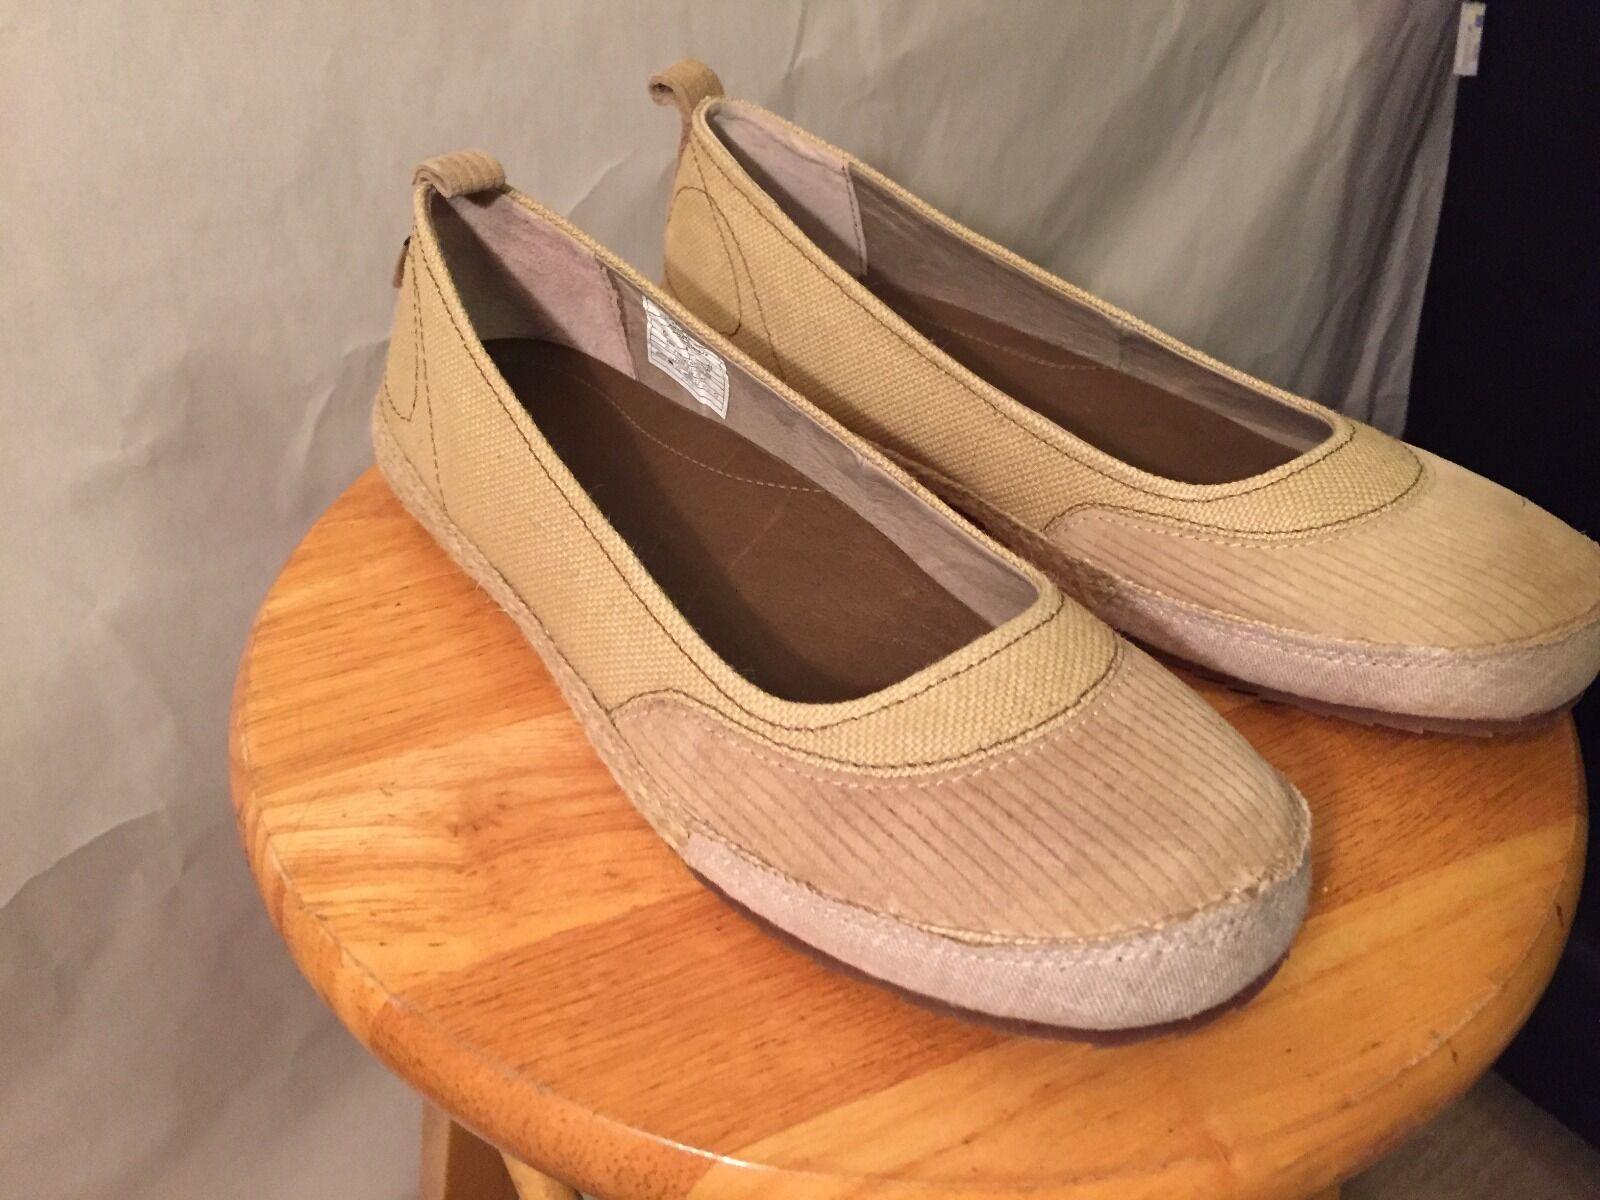 Patagonia NUKA Size 10 Women's Shoes in Rhetro Khaki Hemp Upper Material -Comfy!